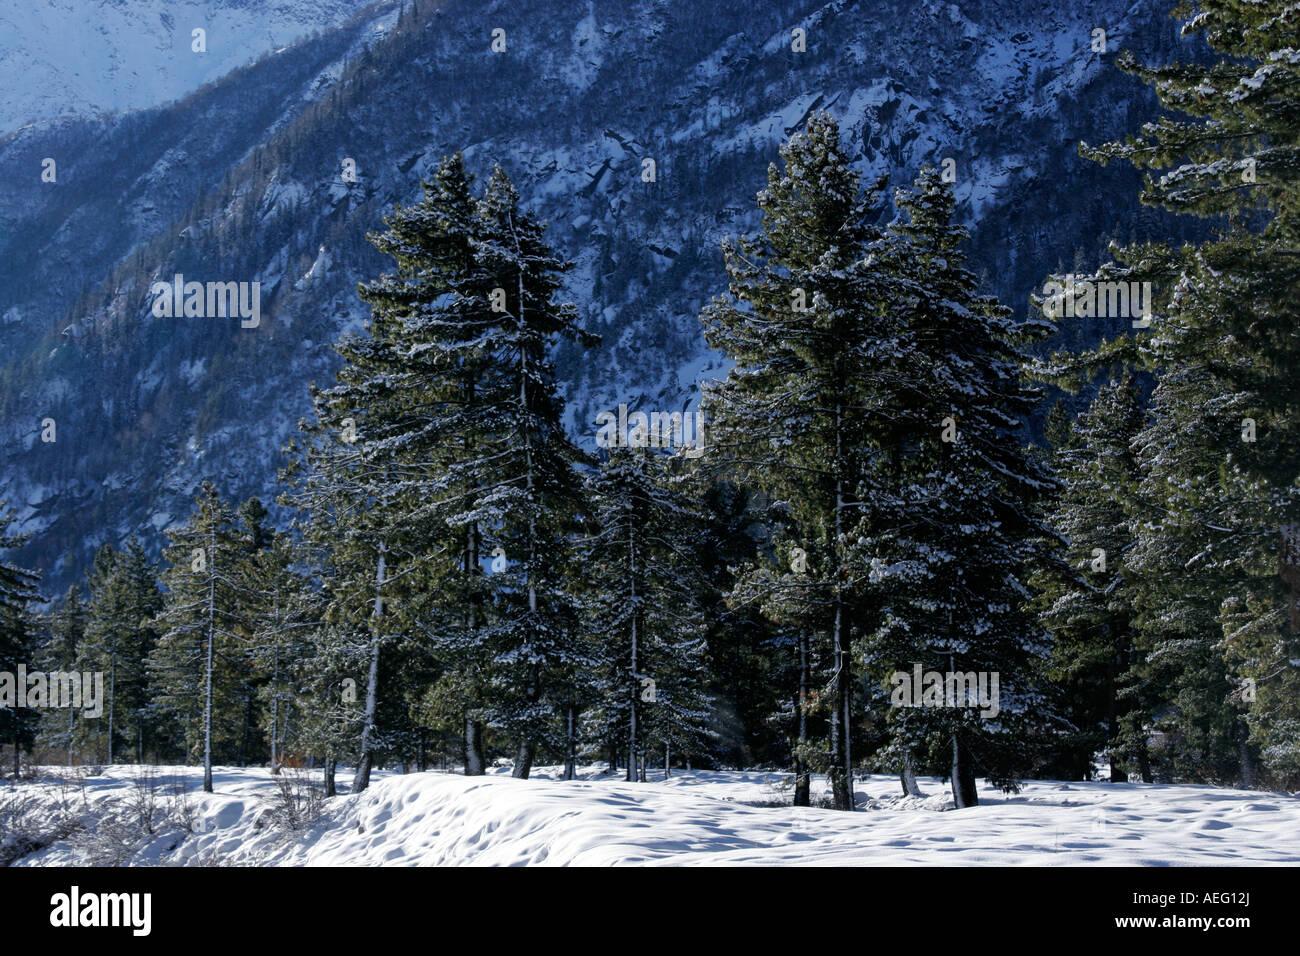 View of pine trees during winter season in village Rakcham